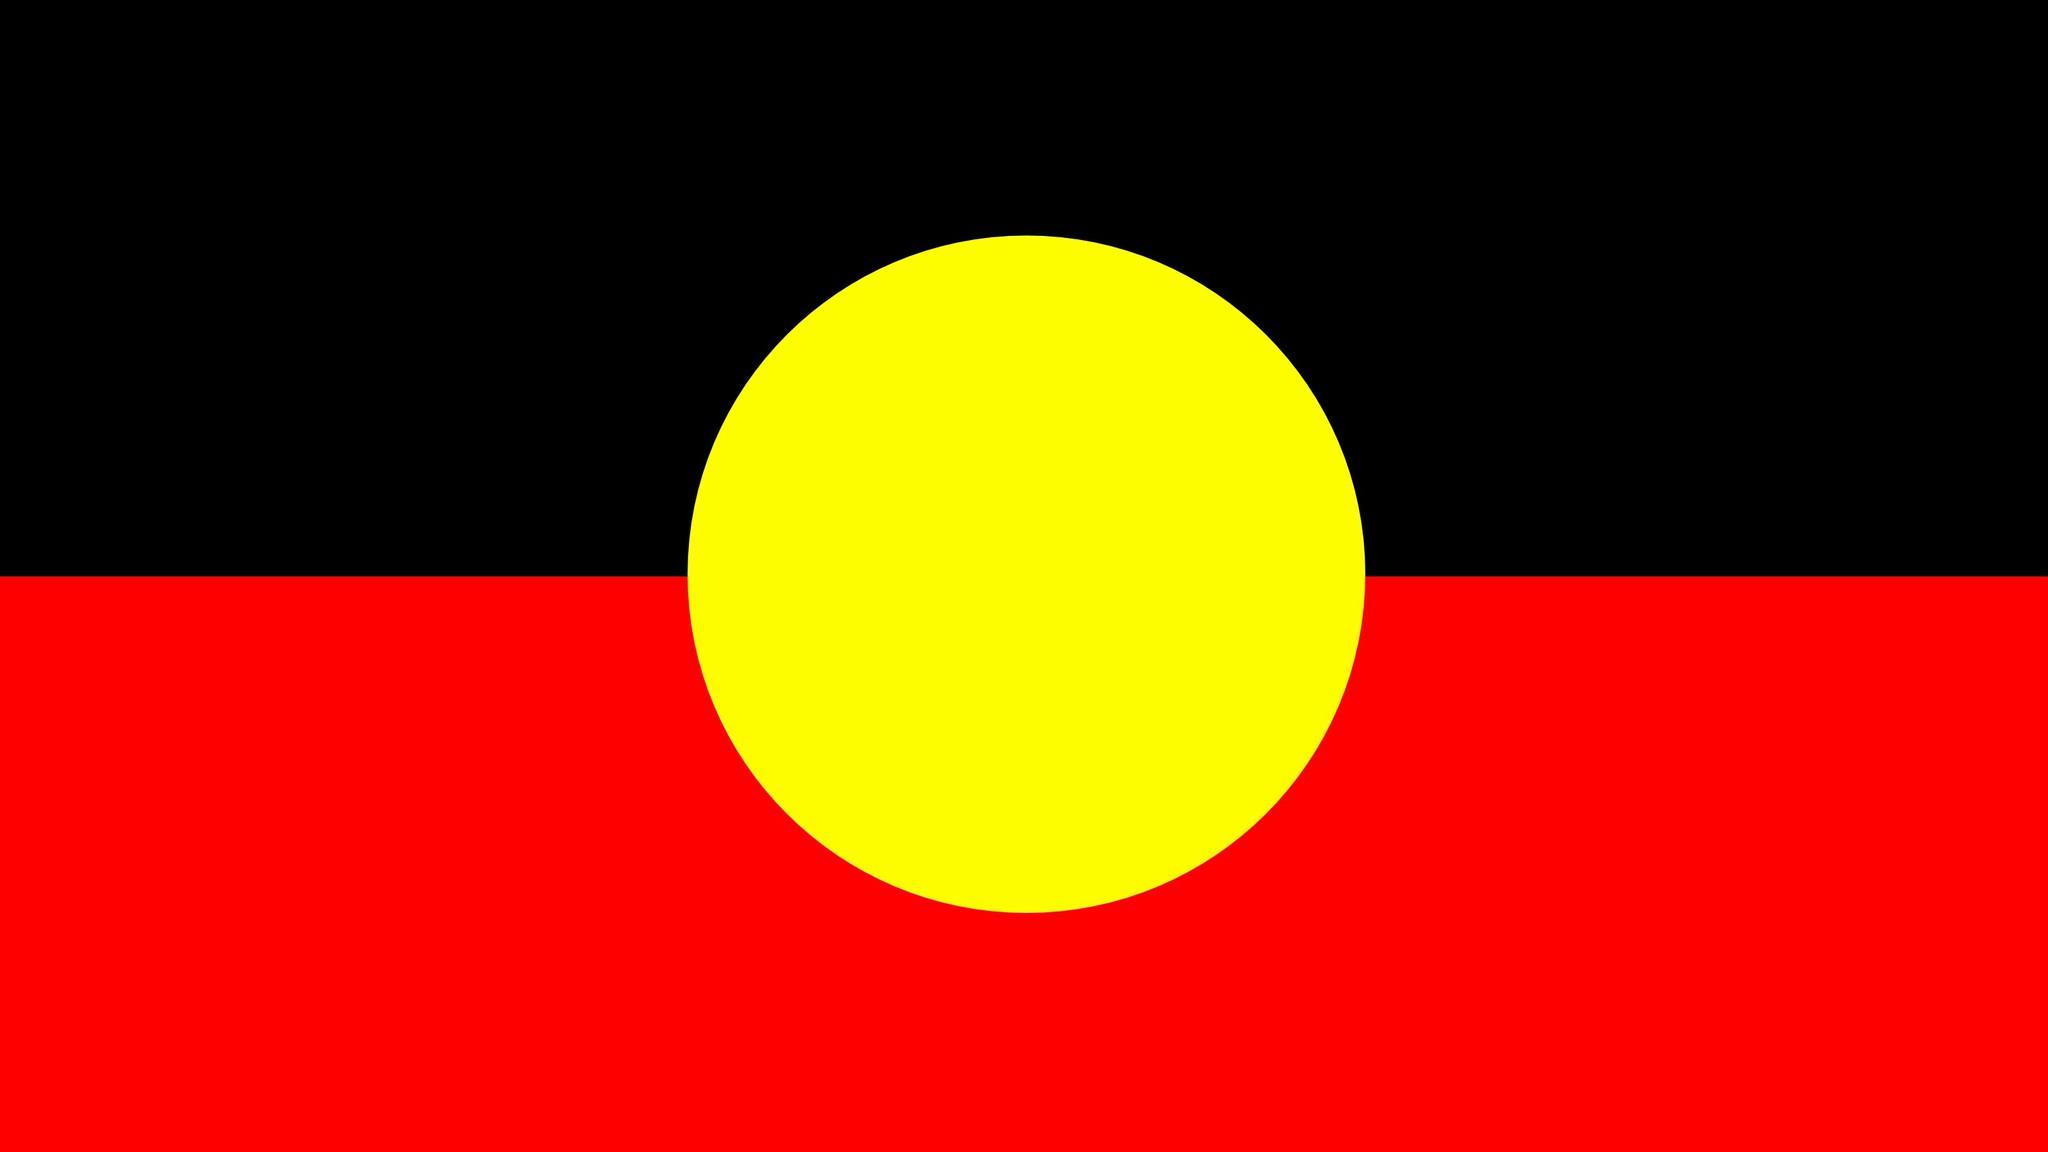 Australian aboriginal flag wallpaper 2048x1152